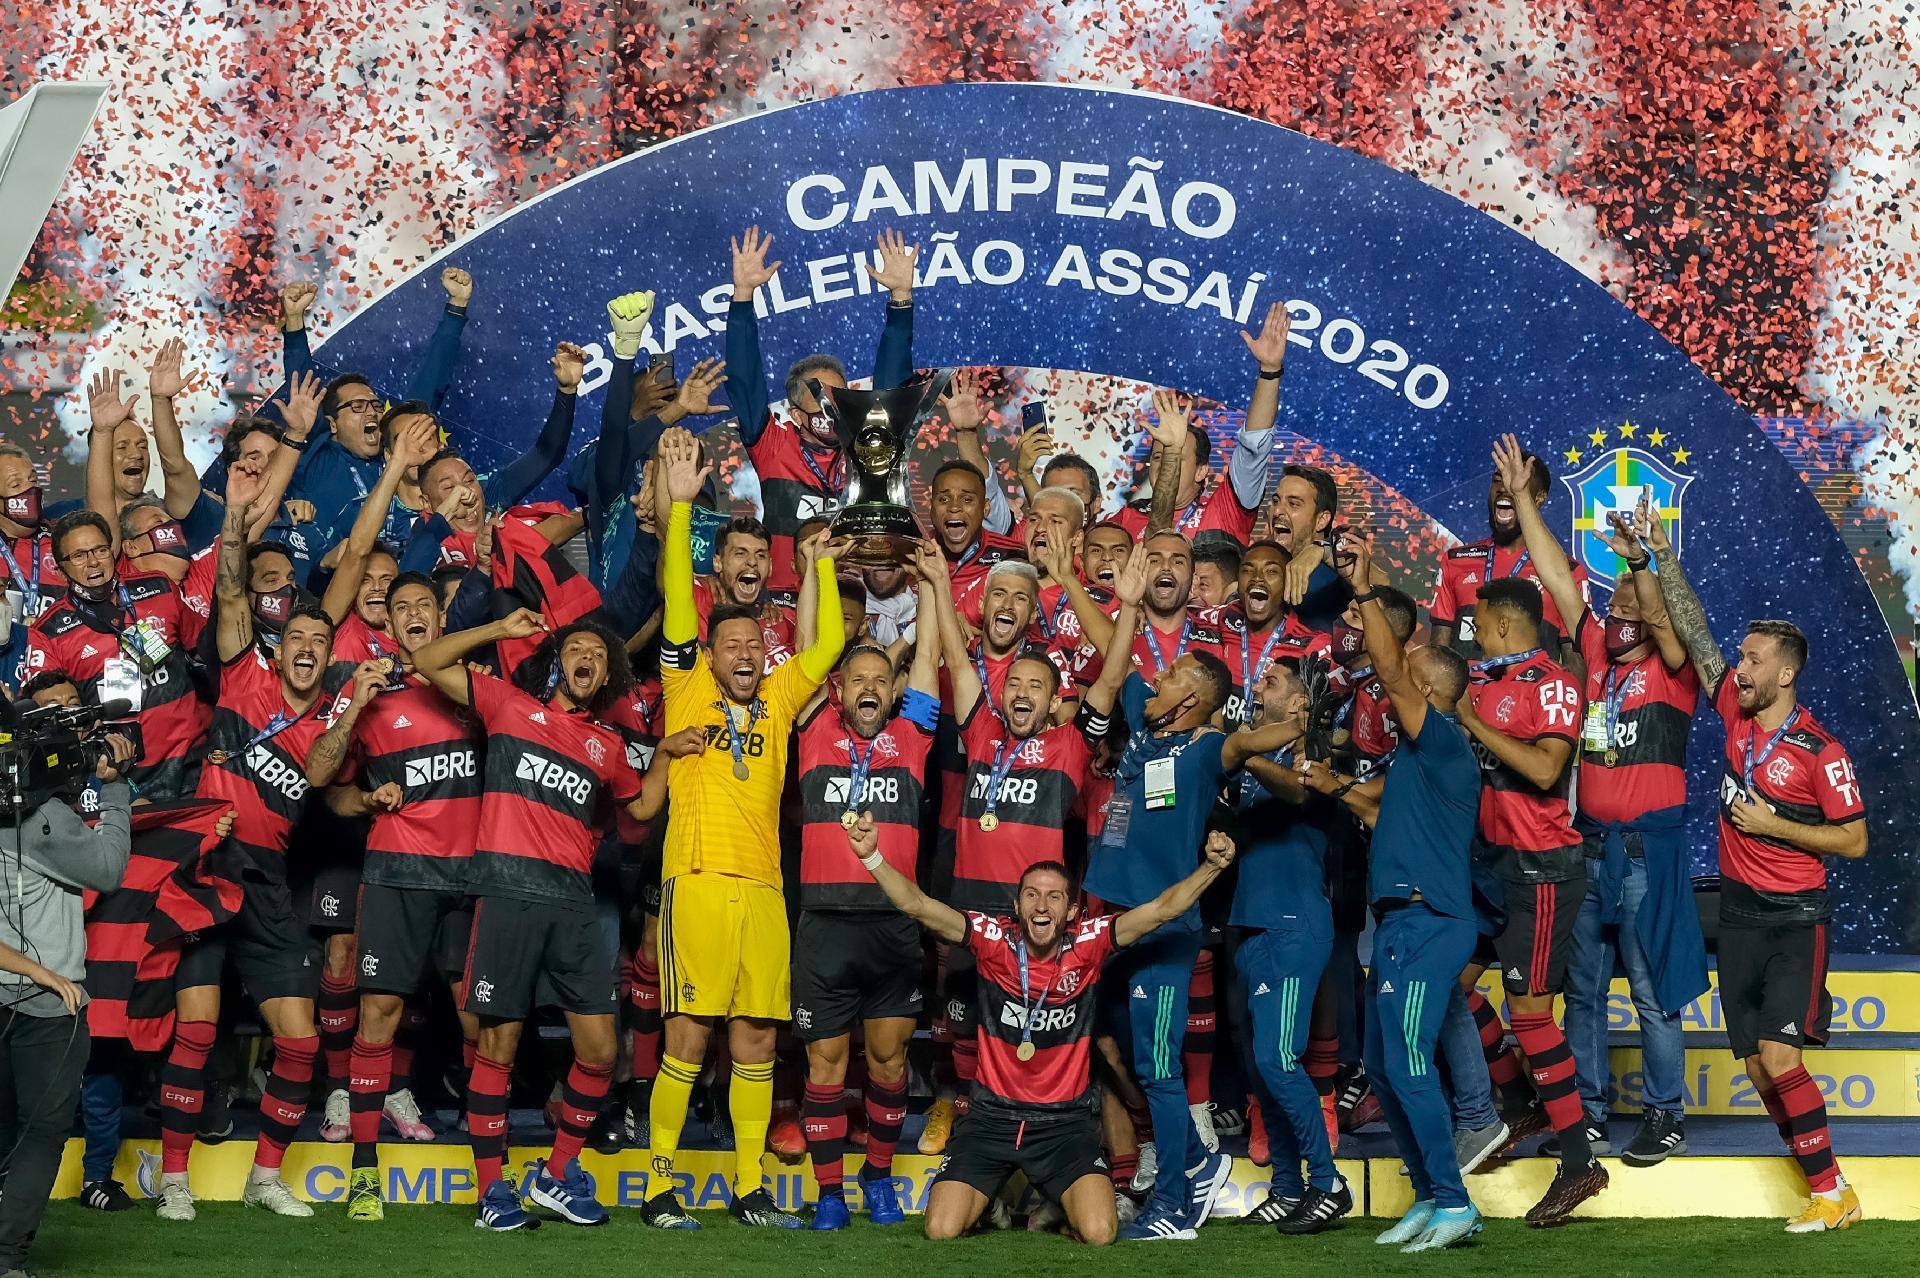 Flamengo é campeão brasileiro Foto: Marcello Zambrana/AGIF